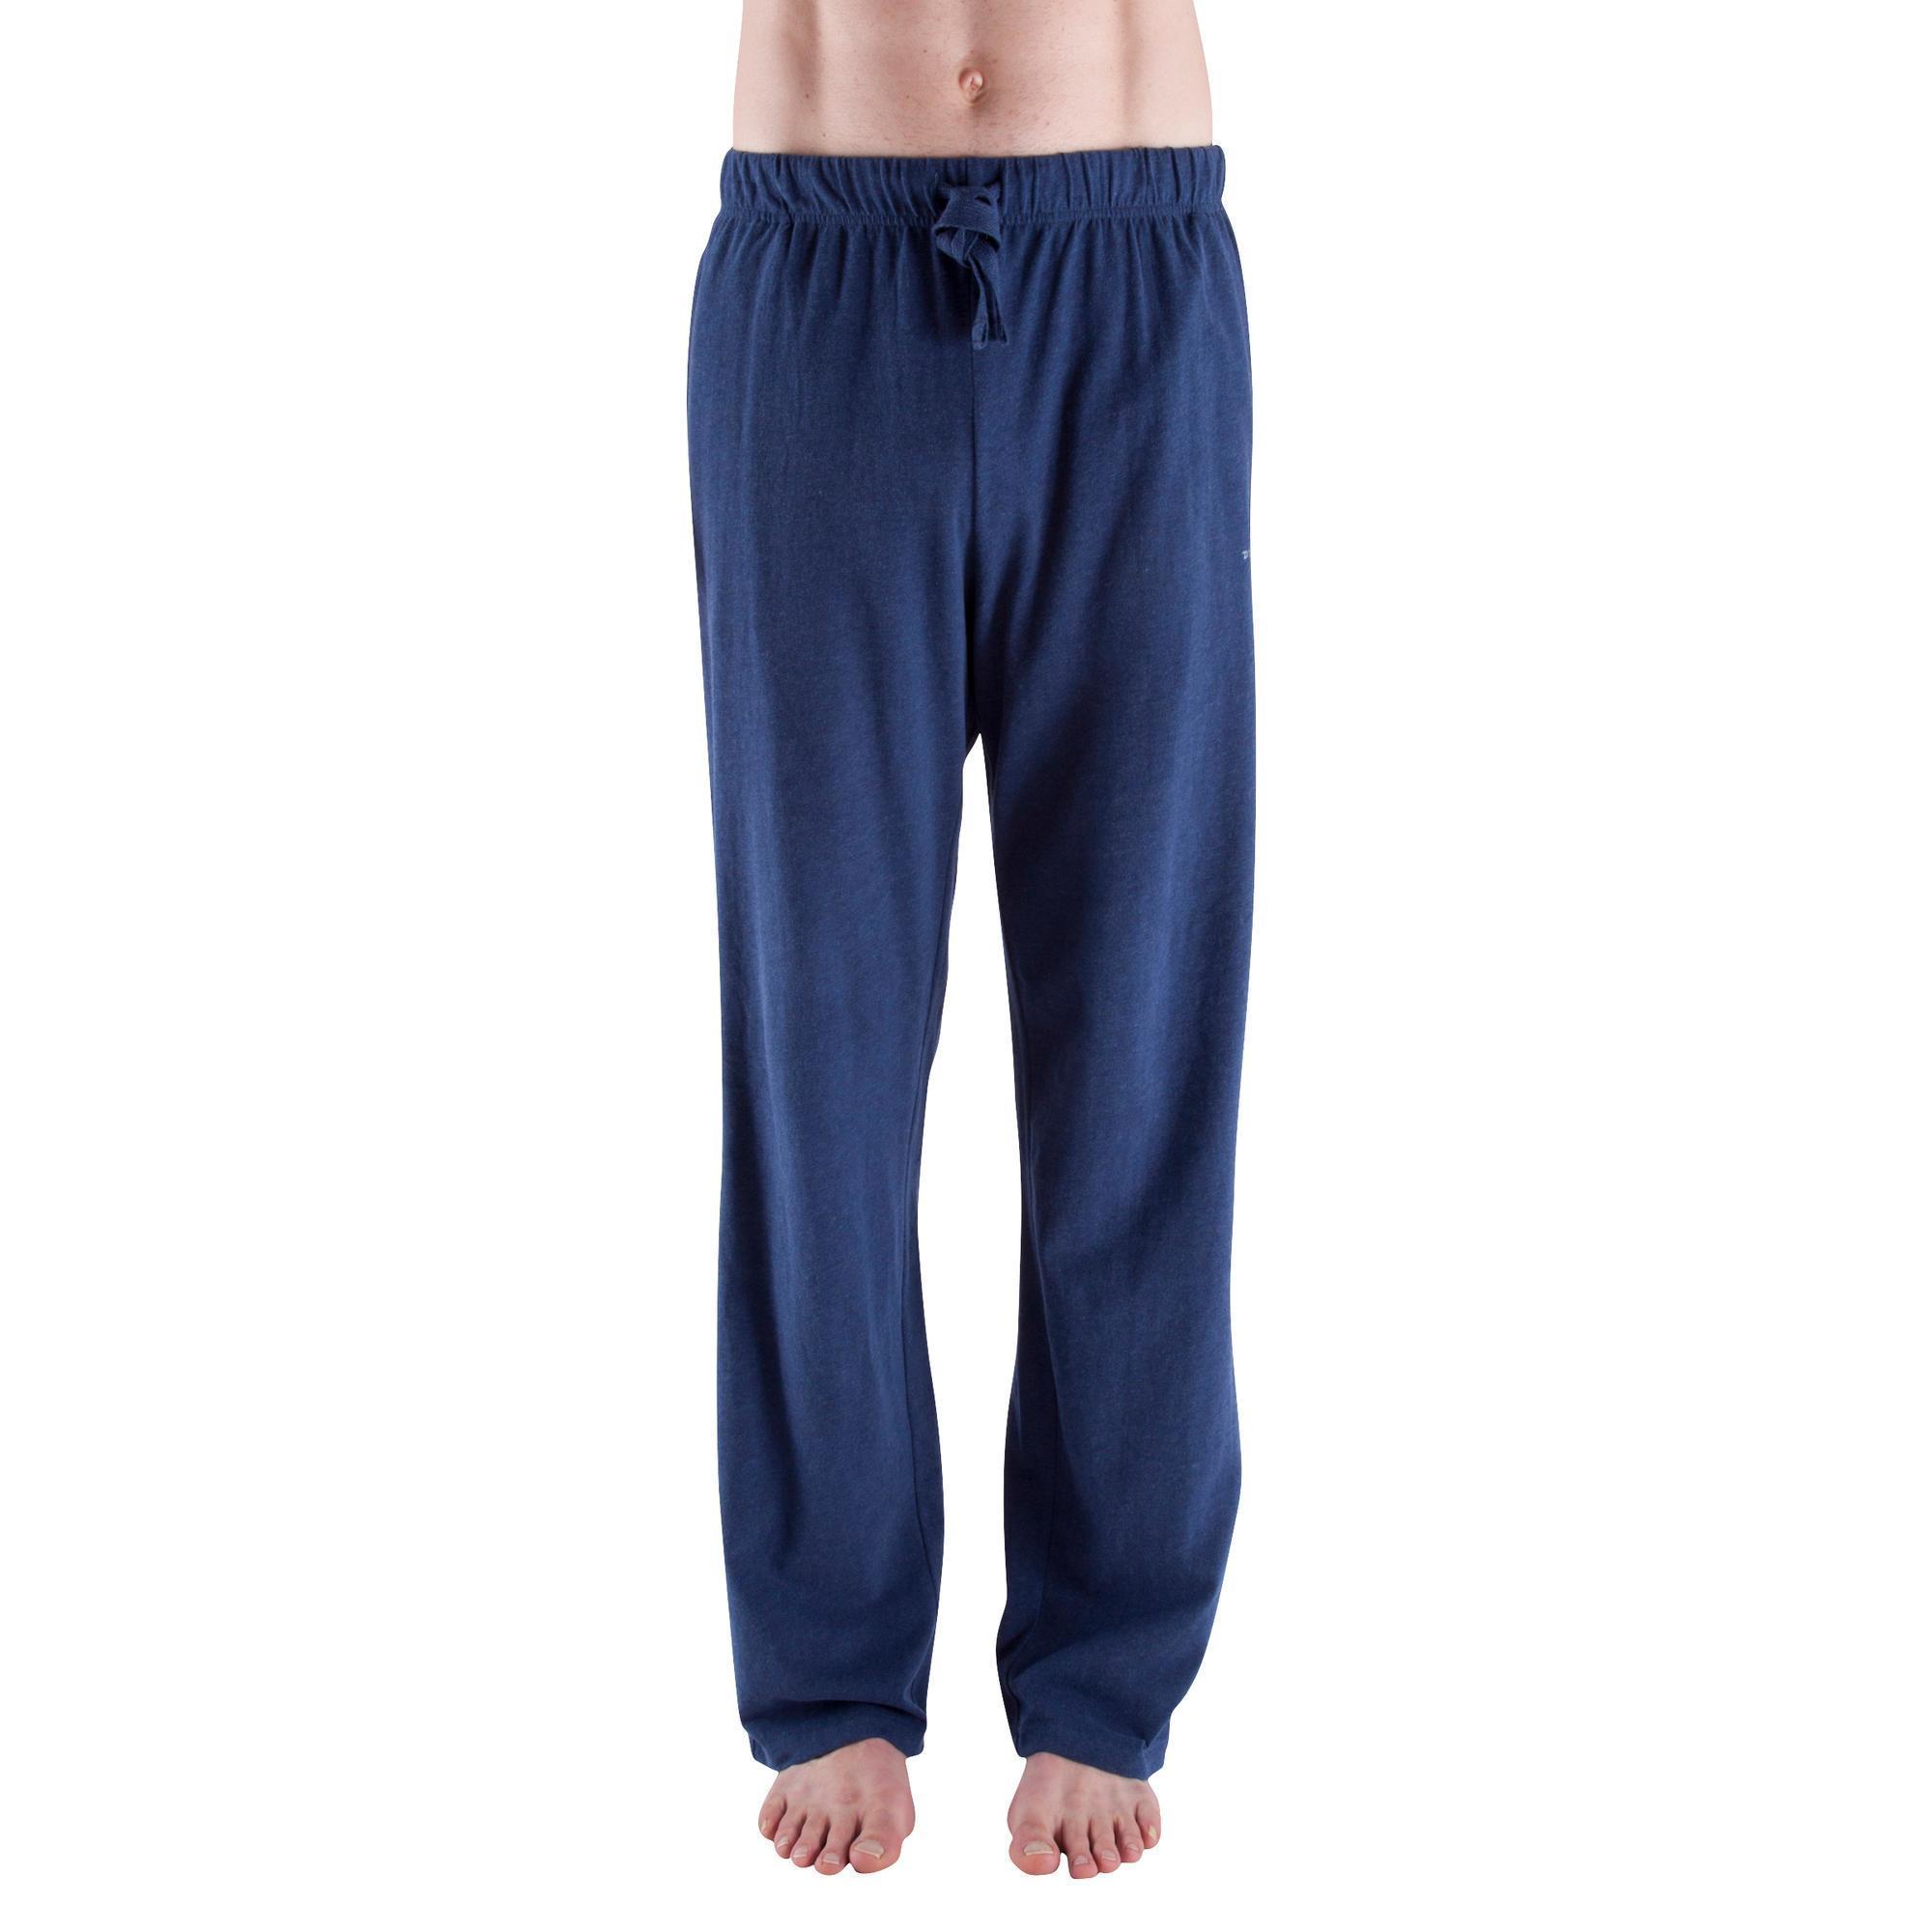 0adb1b6f5 Pantalón hombre gimnasia suave yoga azul jaspeado